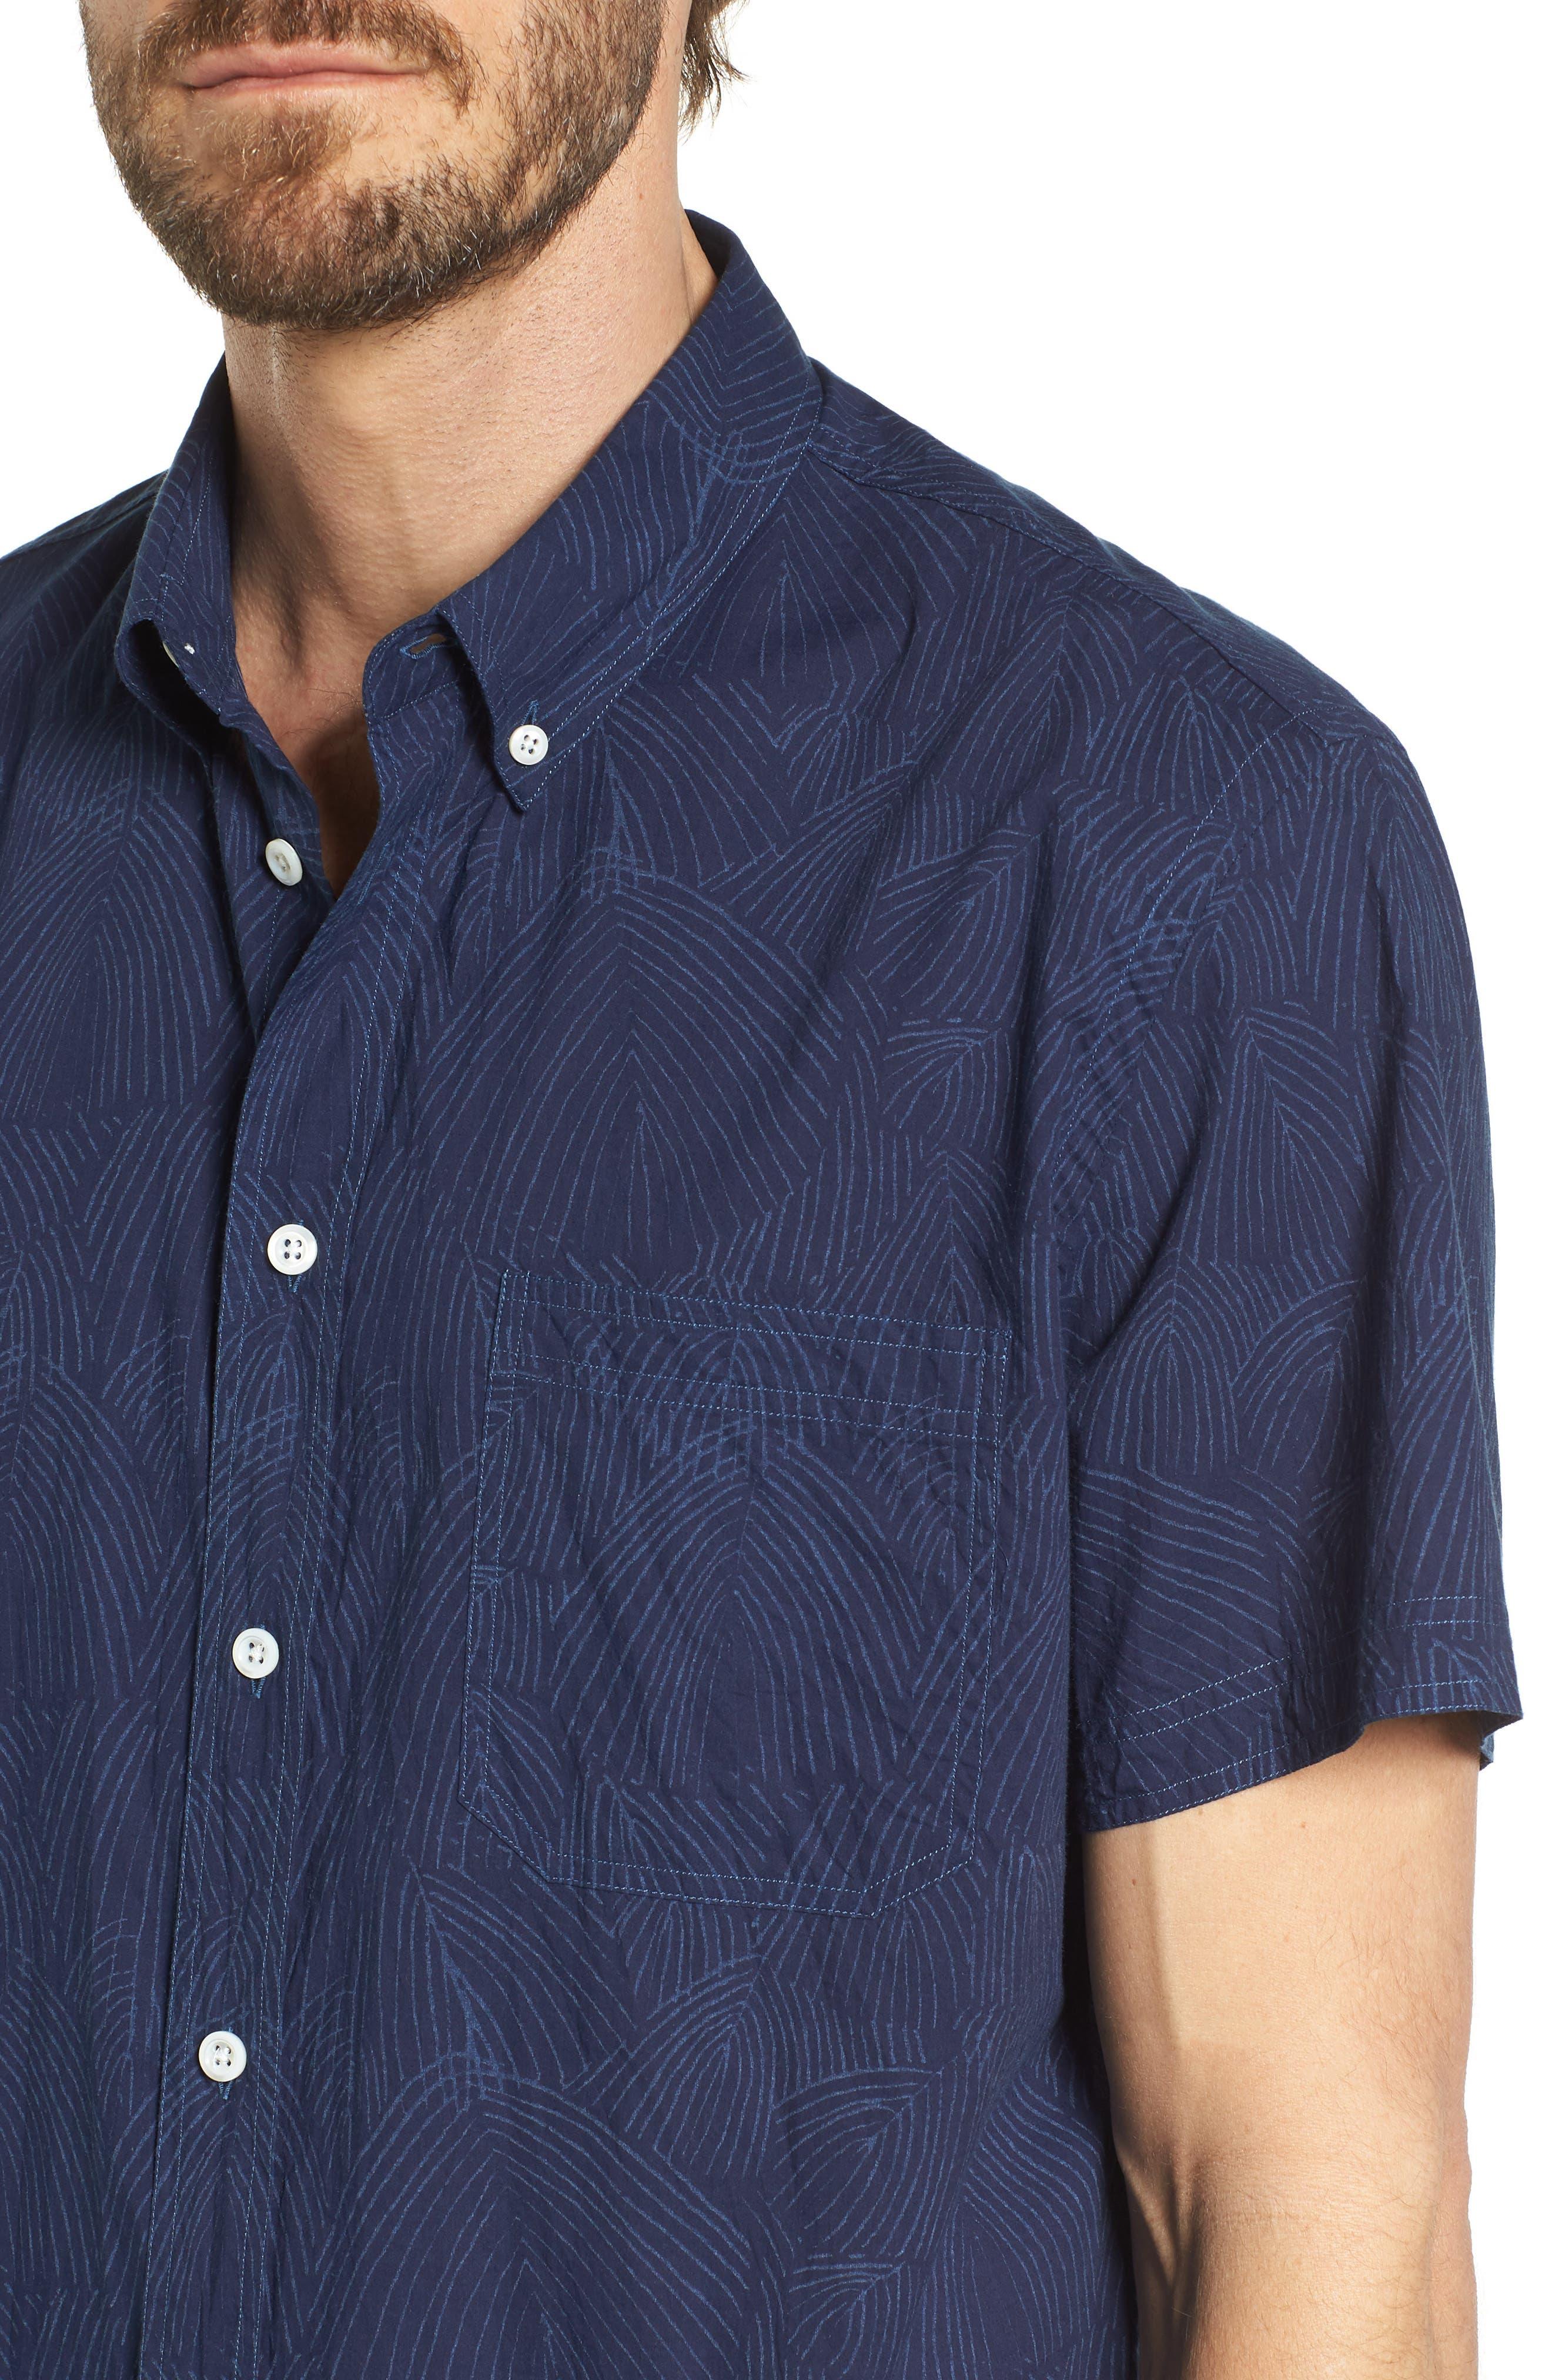 Tuscumbia Slim Fit Sport Shirt,                             Alternate thumbnail 4, color,                             407